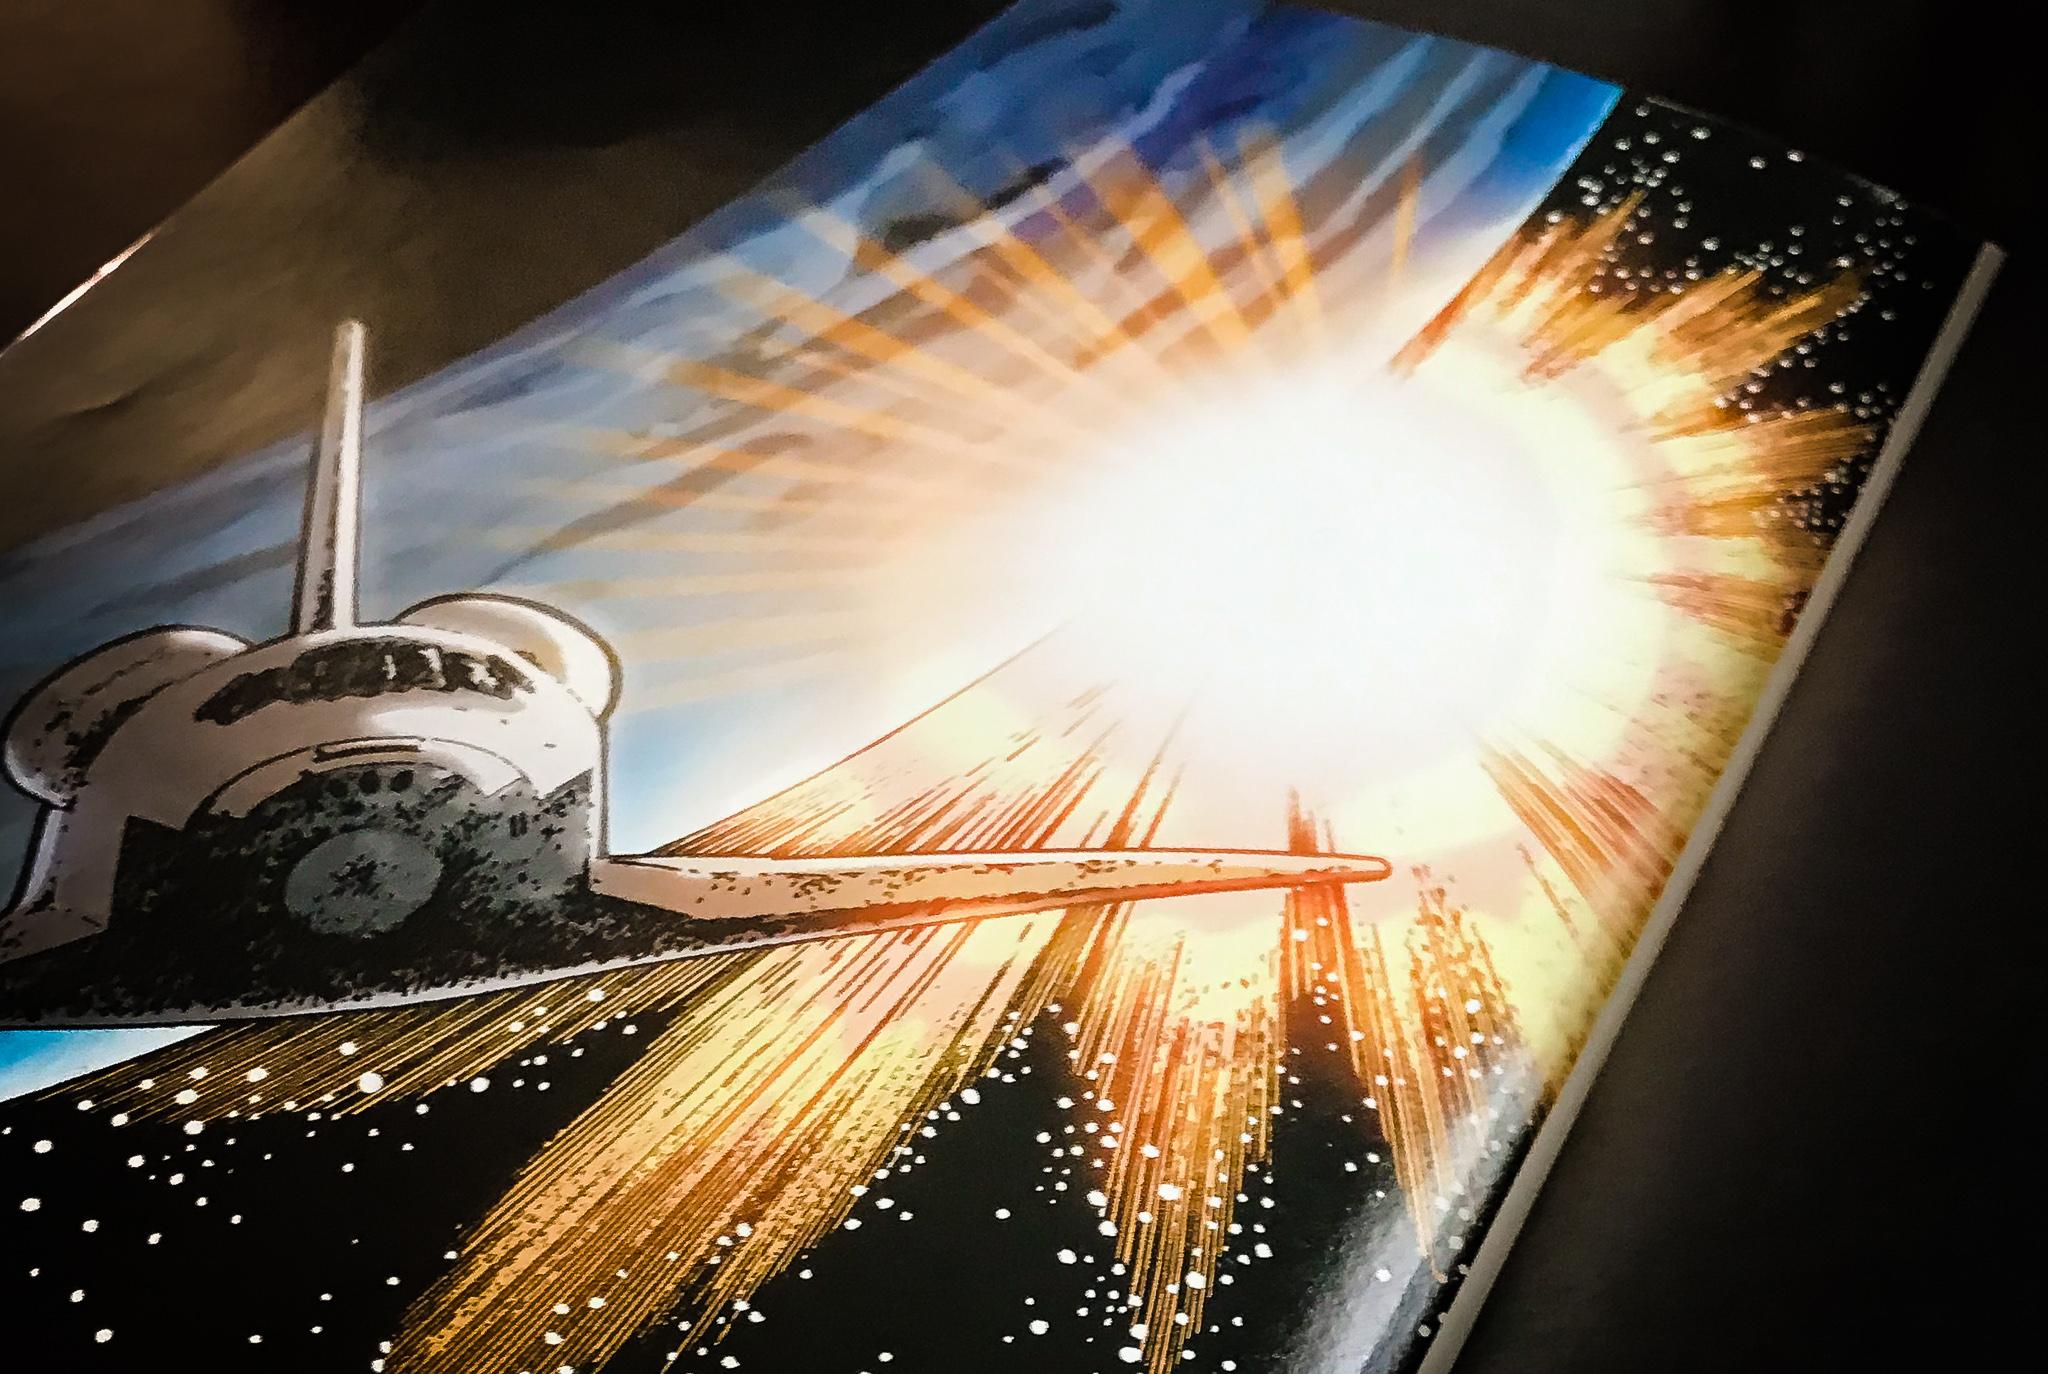 Review of Orbiter by Warren Ellis, Colleen Doran (Illustrator), Dave Stewart (Illustrator)